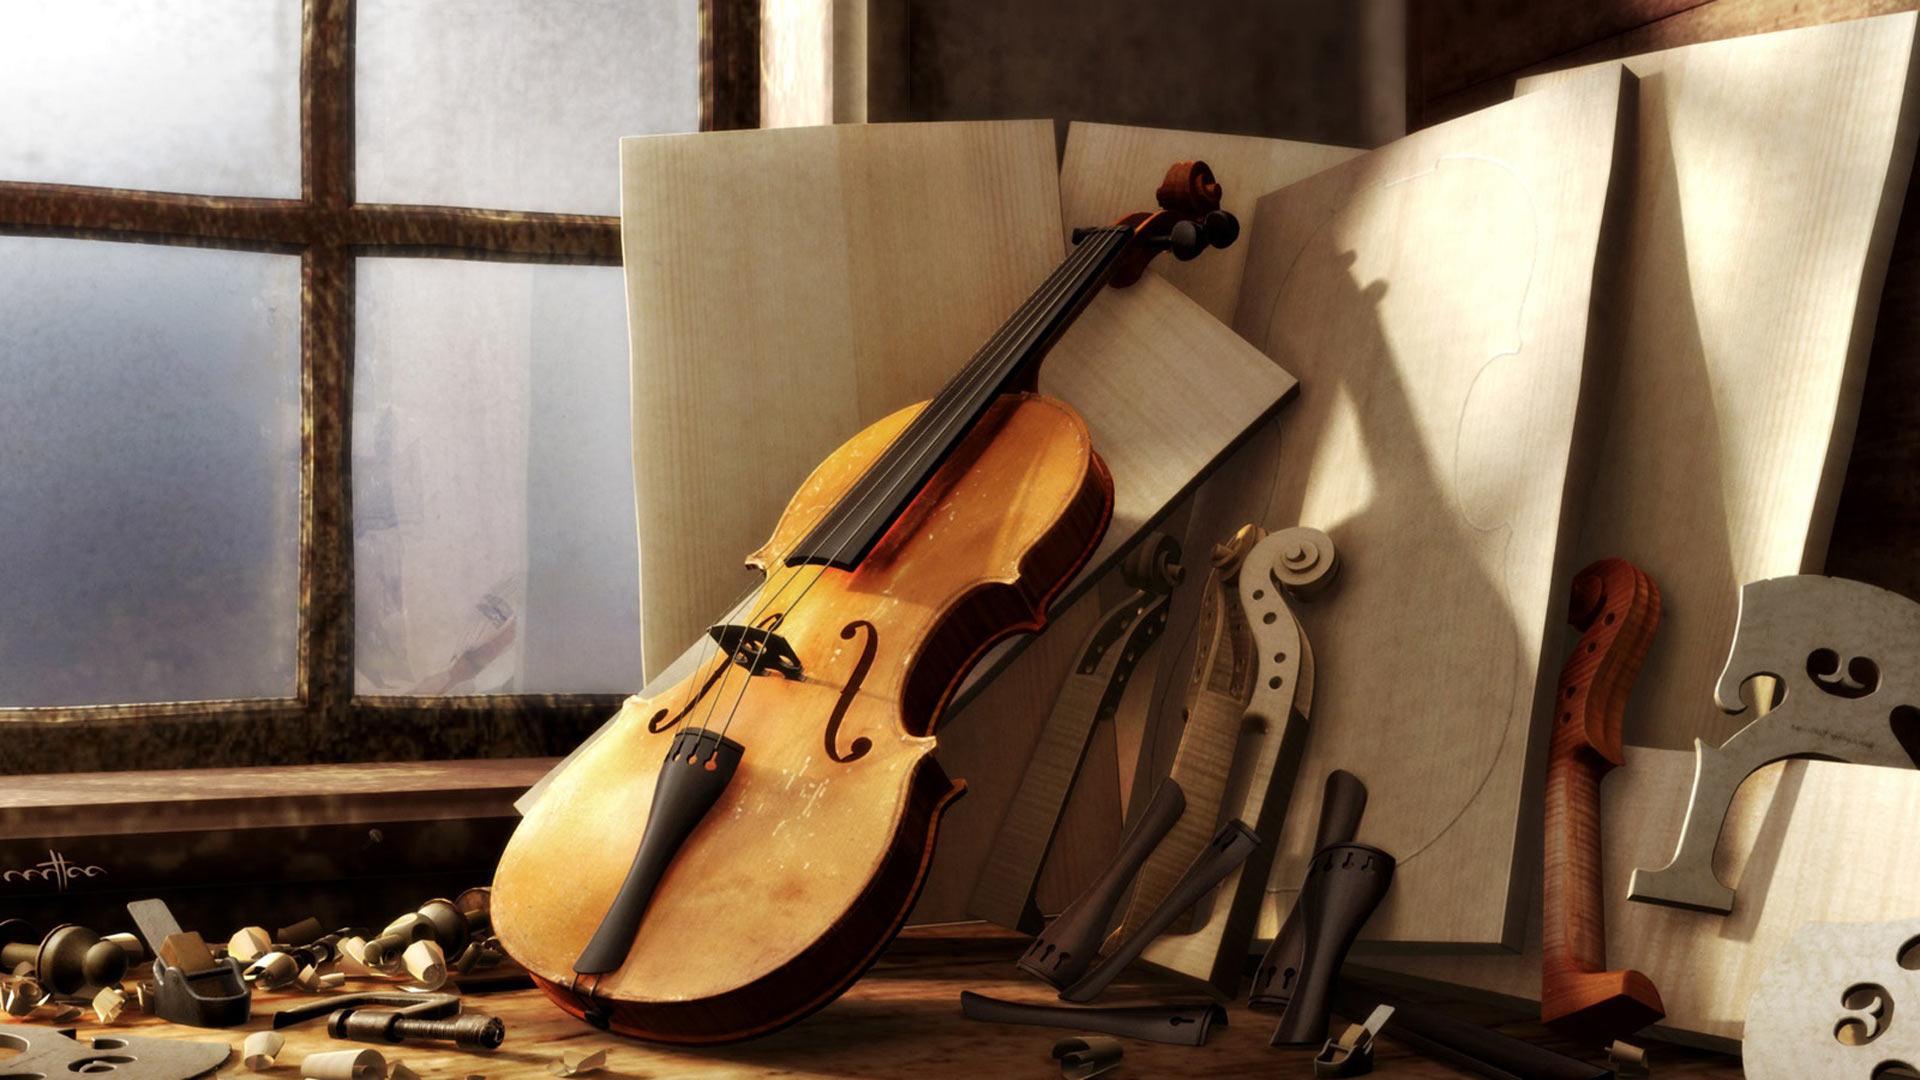 Violin Wallpaper: Violin Wallpapers High Quality